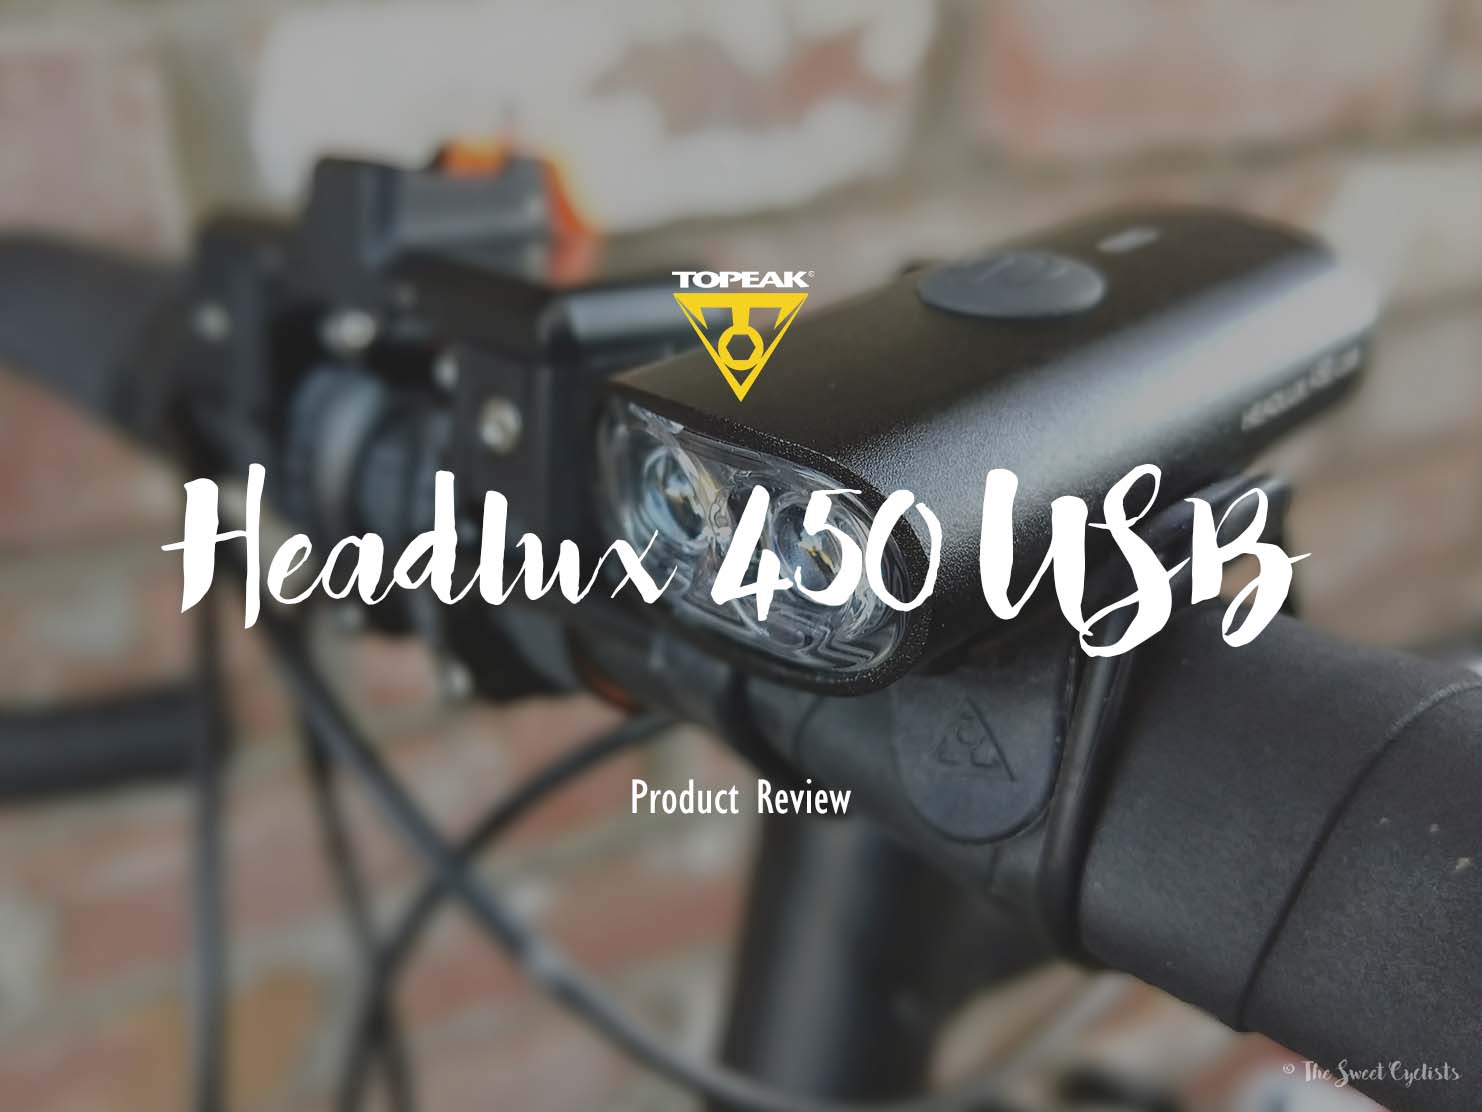 Surprisingly powerful yet versatile Topeak Headlux 450 USB